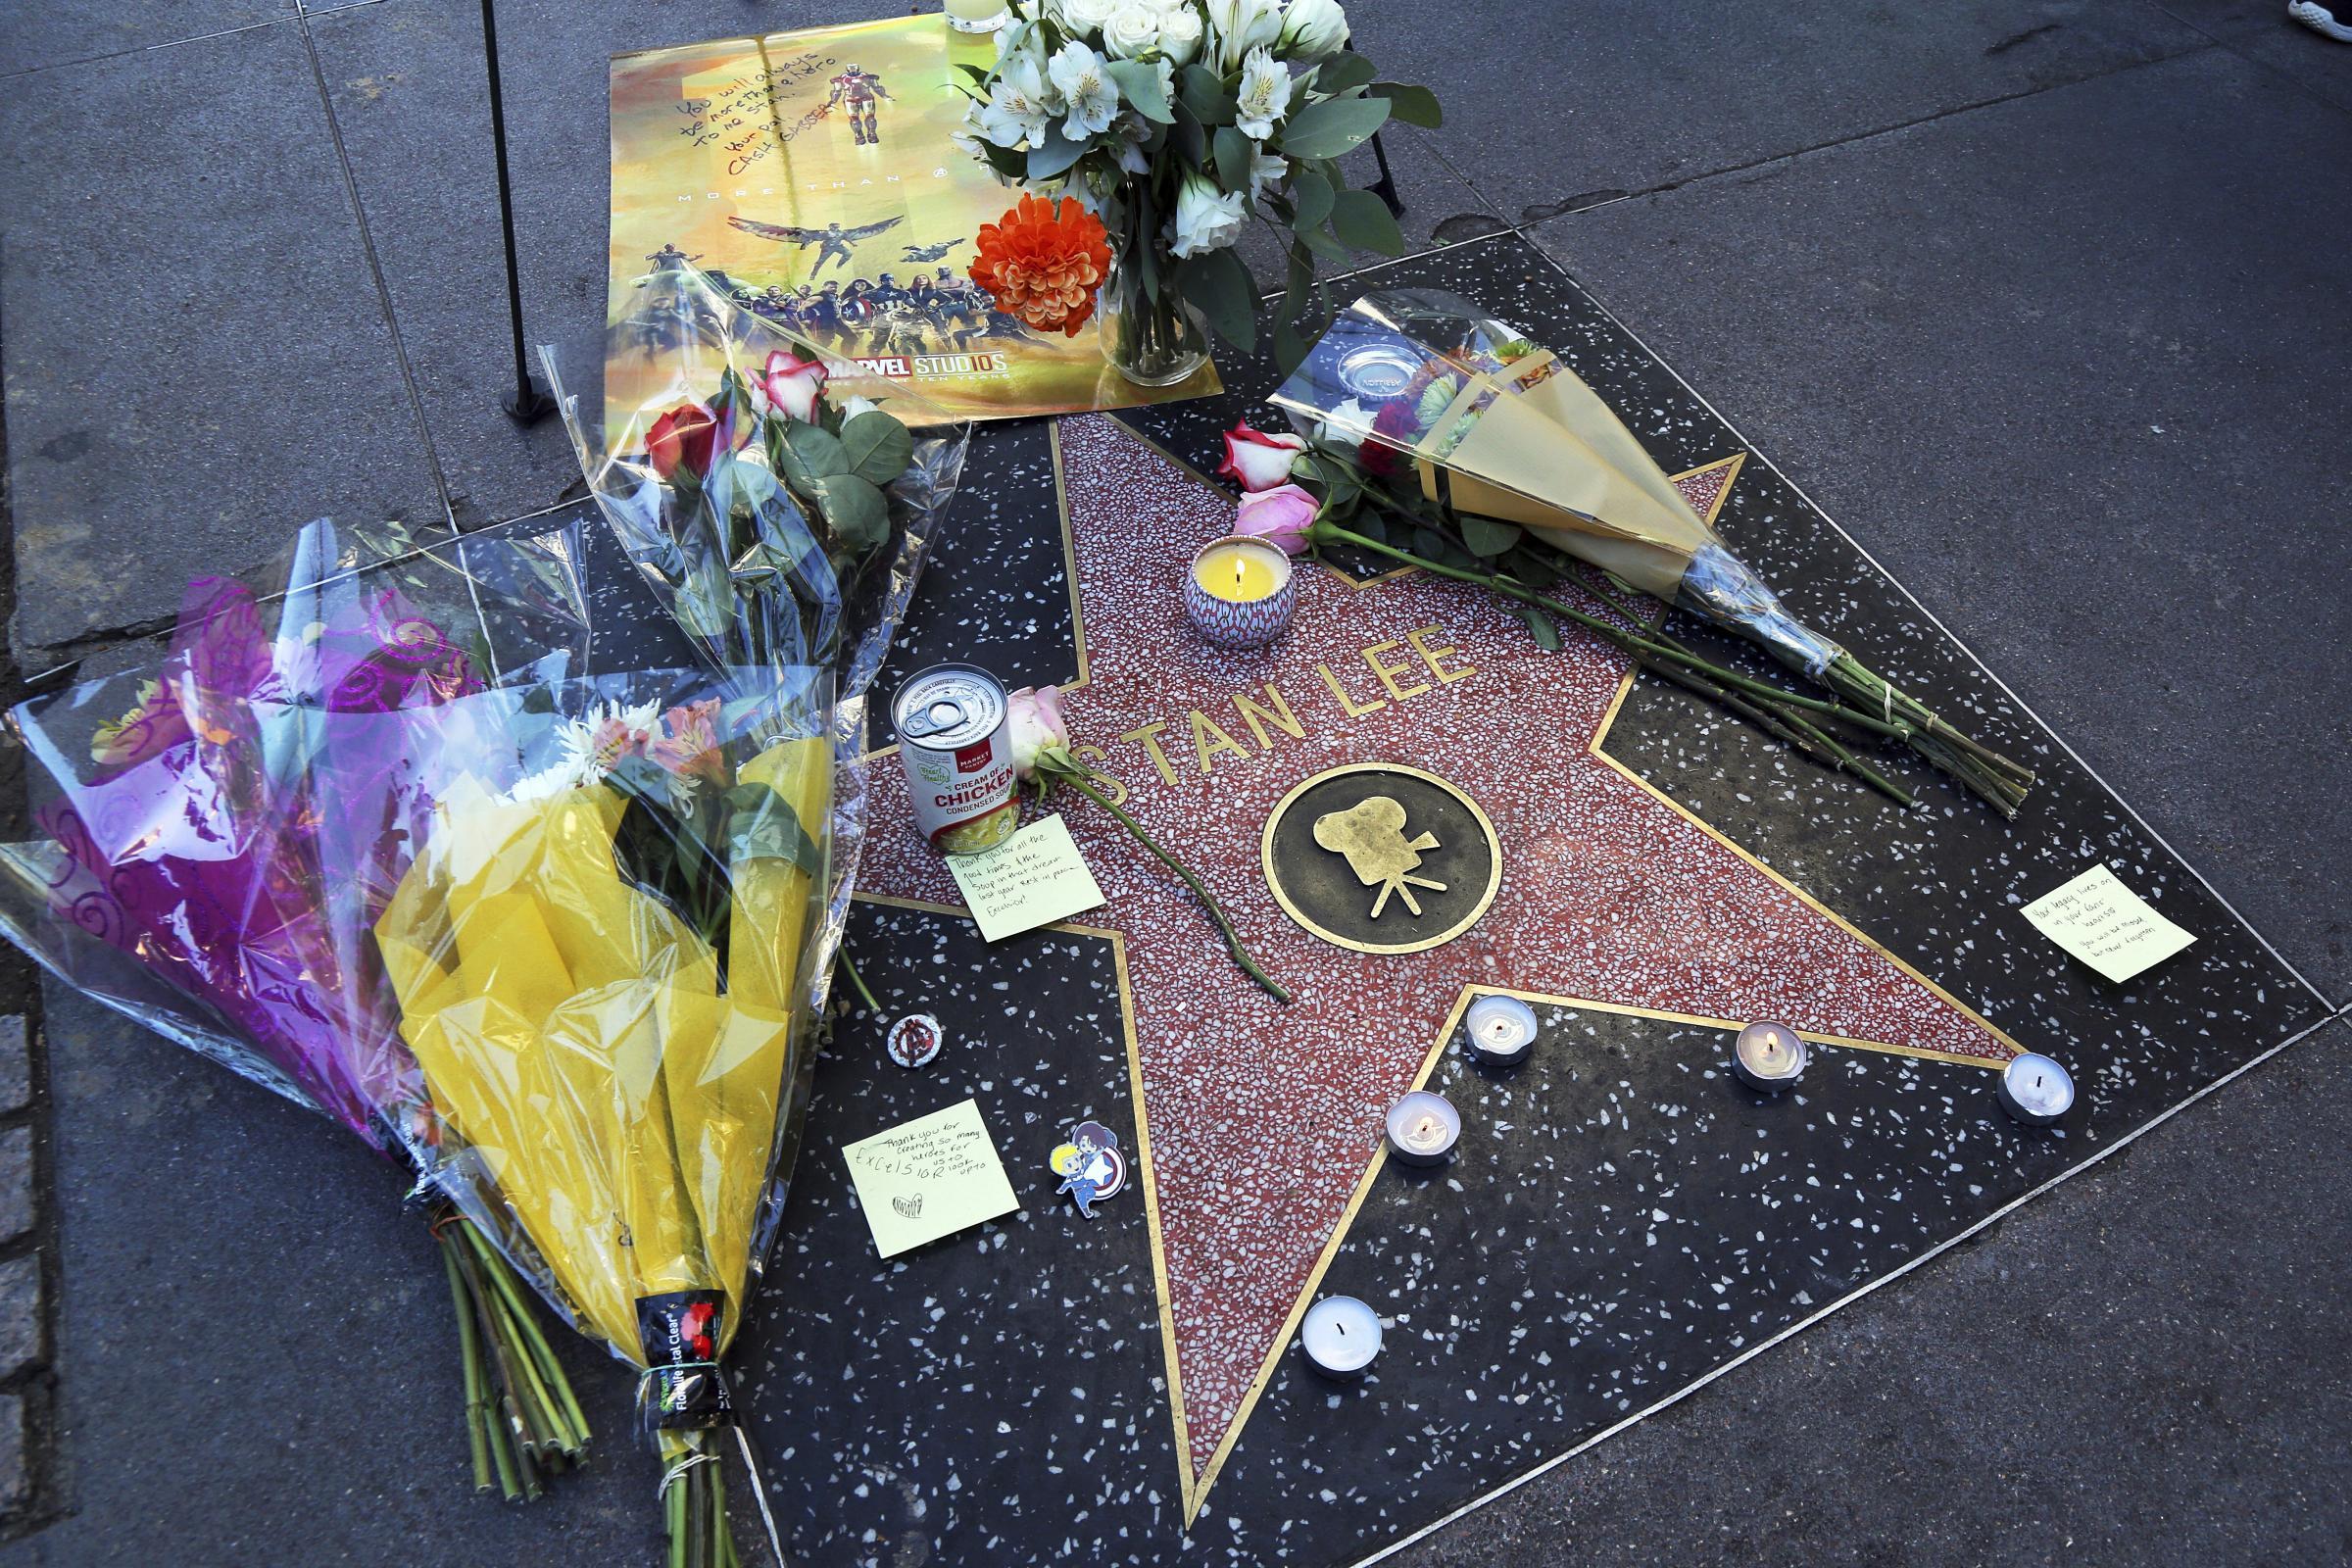 Artists create heartbreaking tributes to comics pioneer Stan Lee